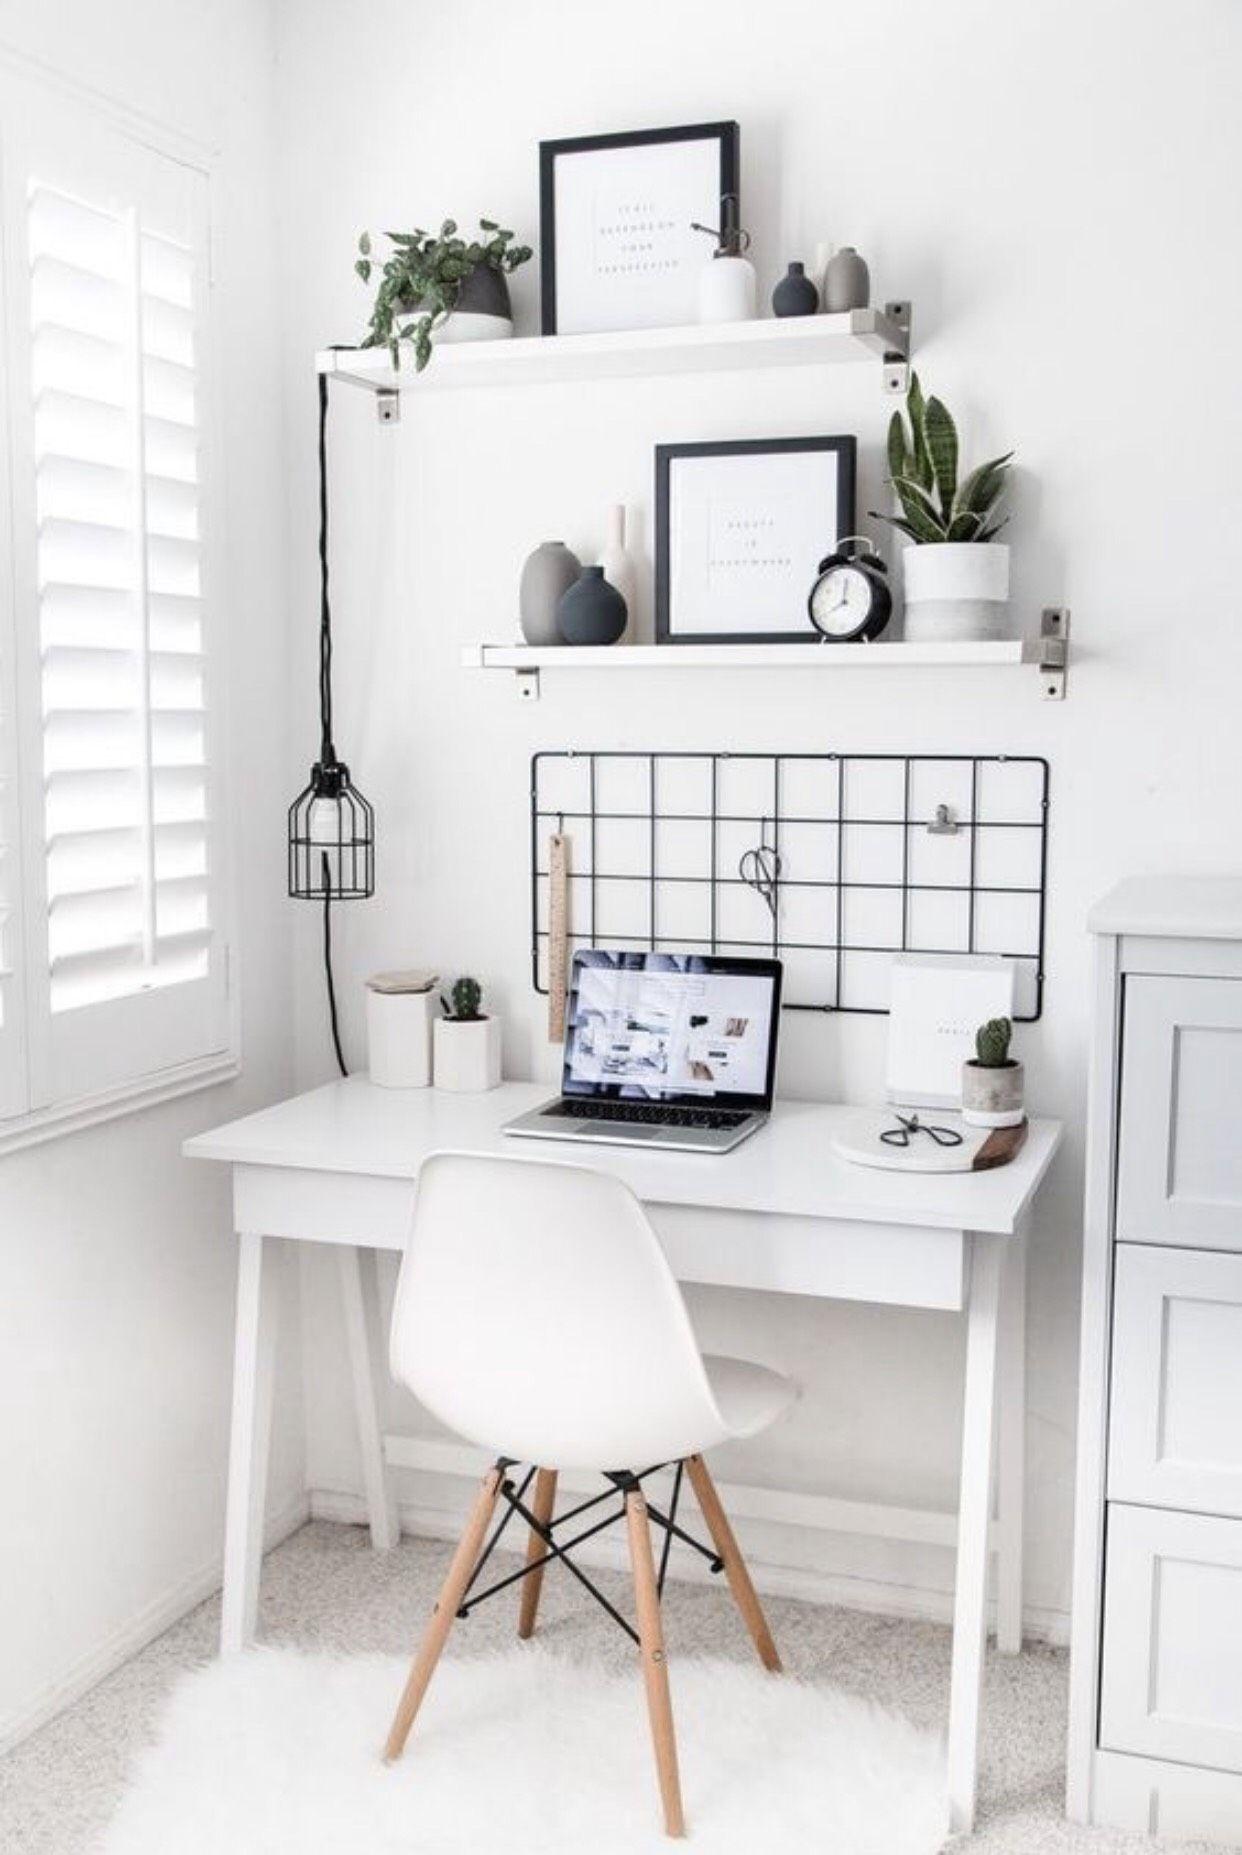 Dsw chair replica eames cheap minimalist living room